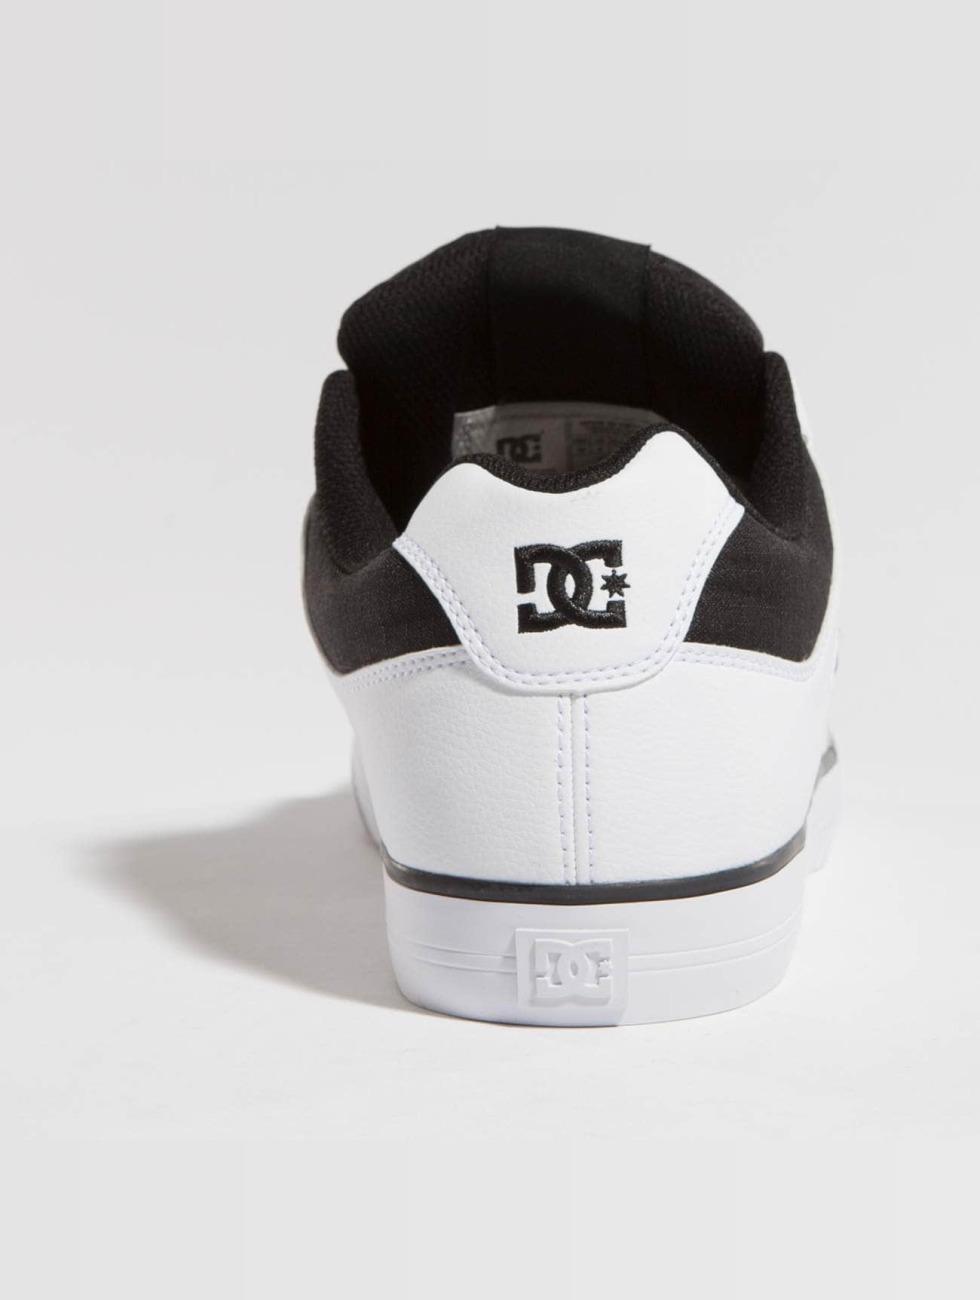 Dc Schoen / Sneaker Puri Di Spirito 421.772 6nEq4s7Tx